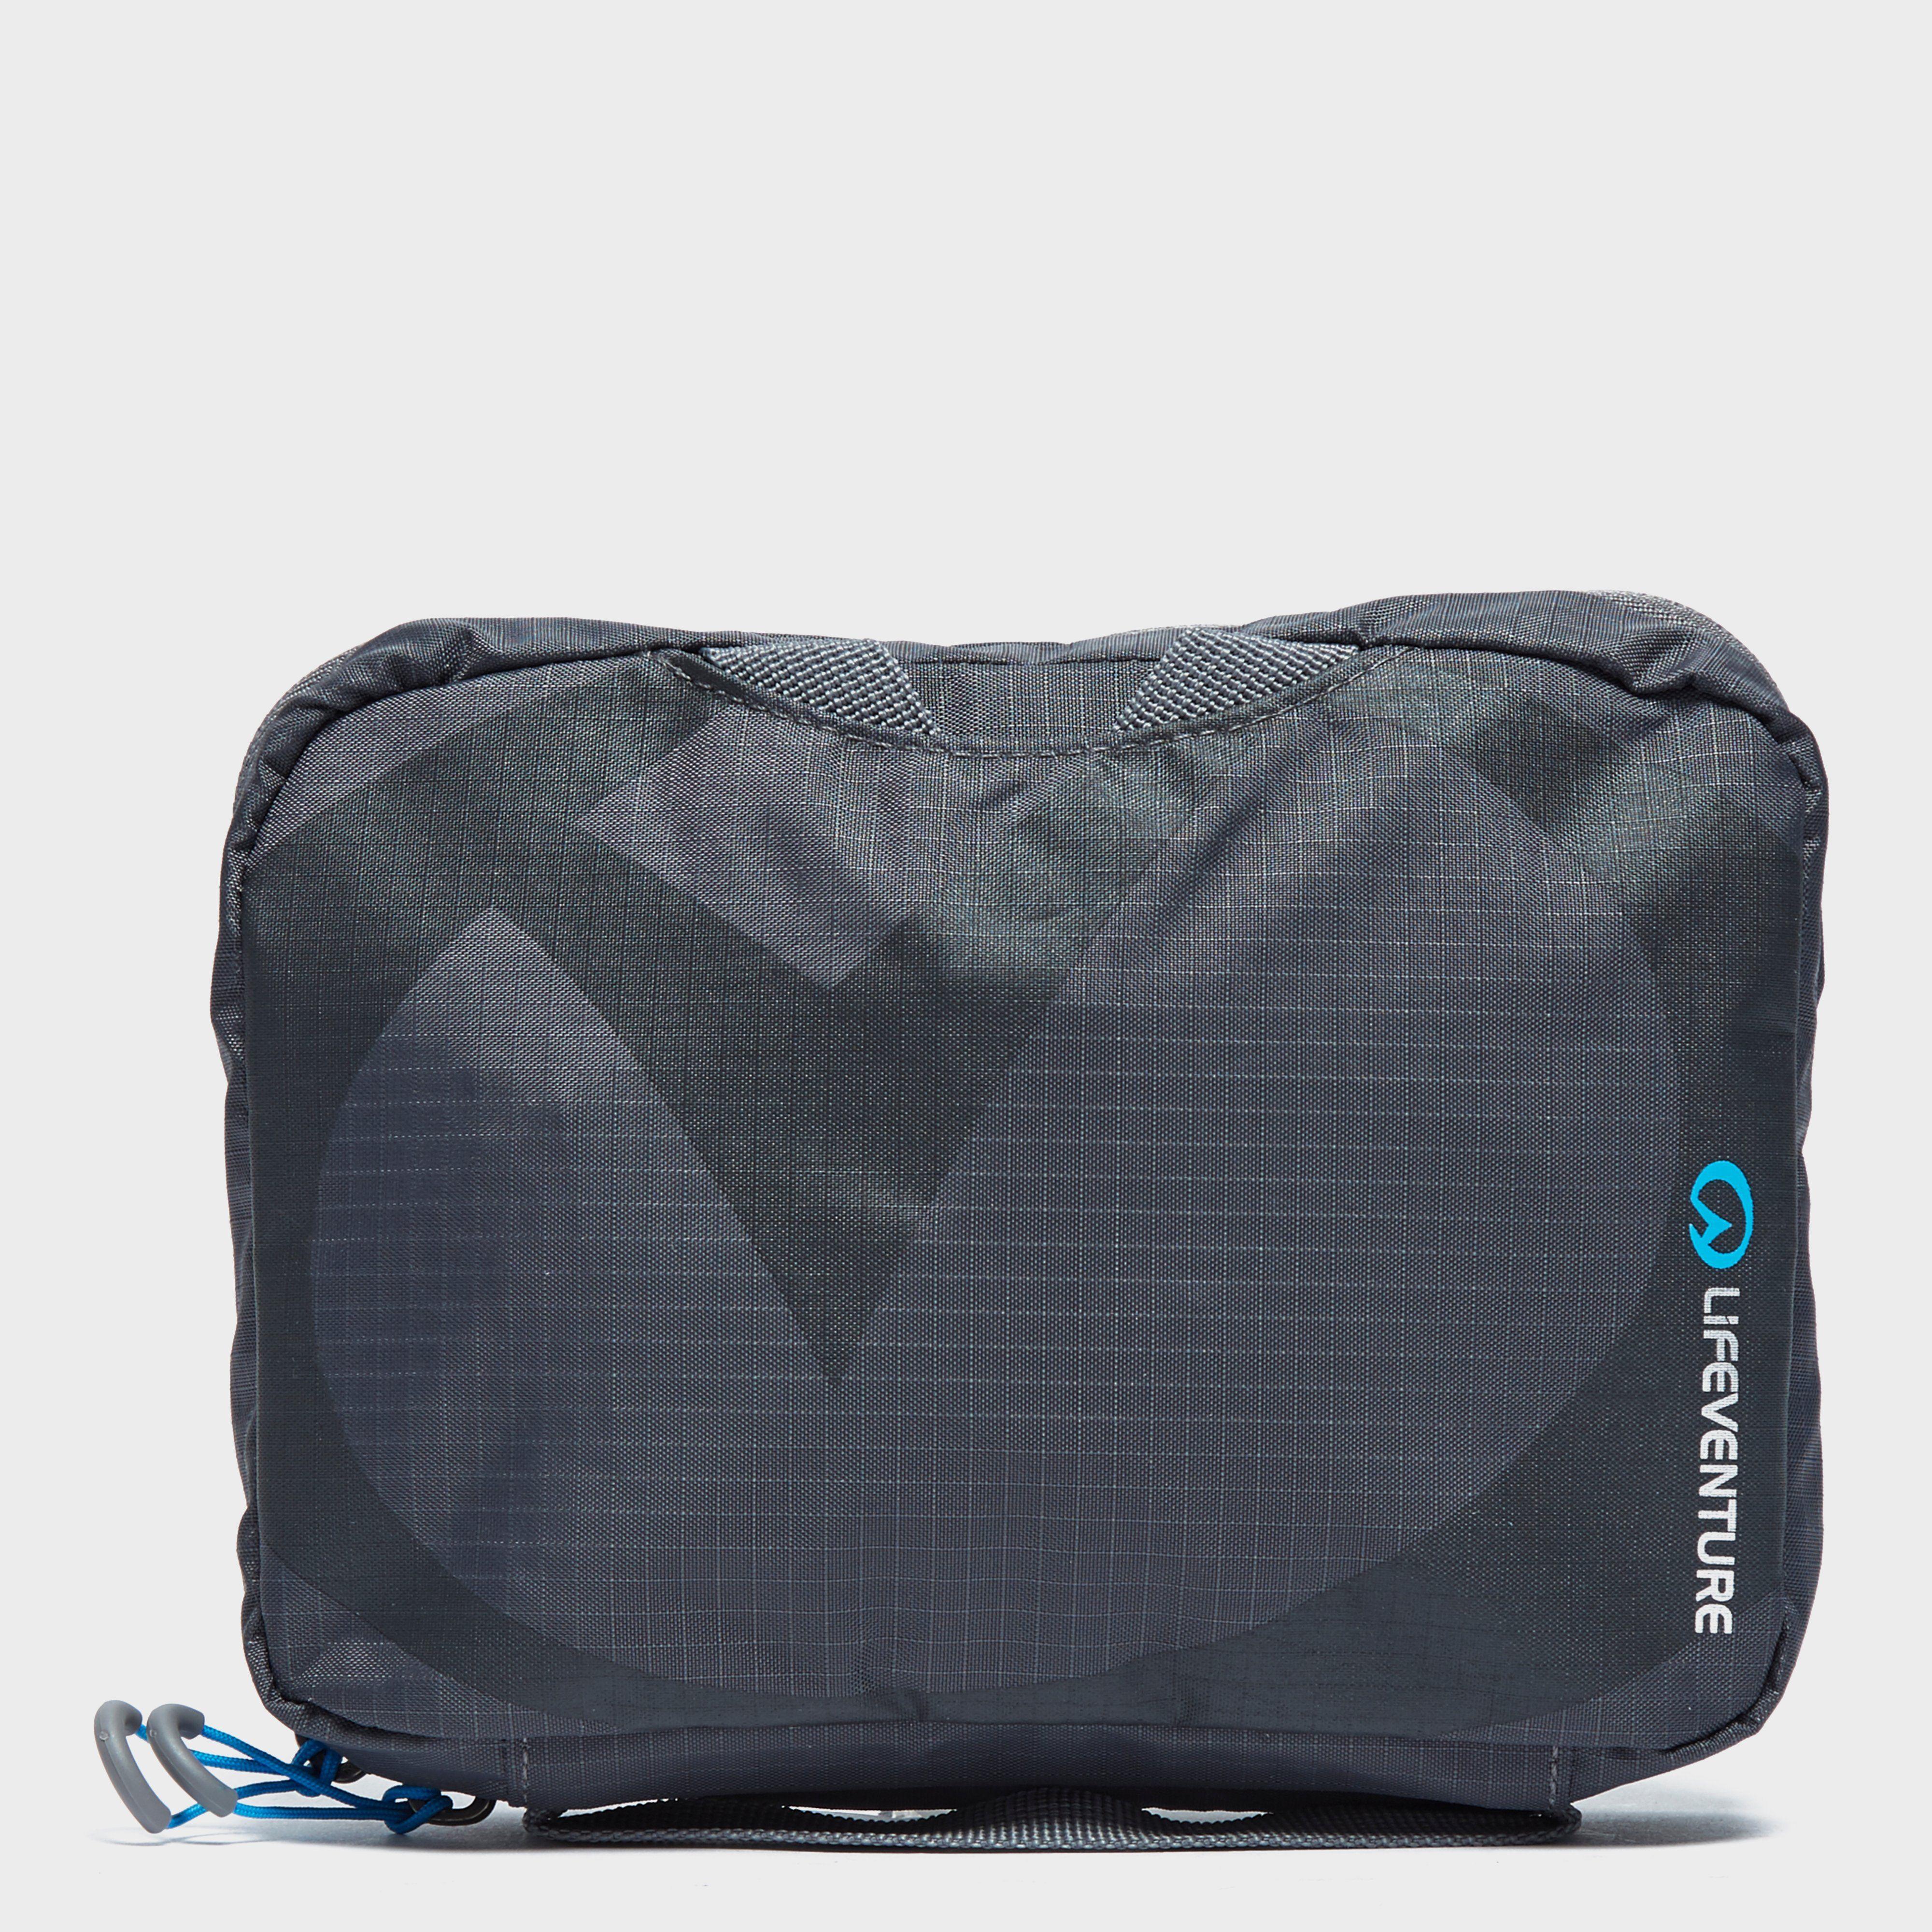 LIFEVENTURE Travel Wash Bag (Small)